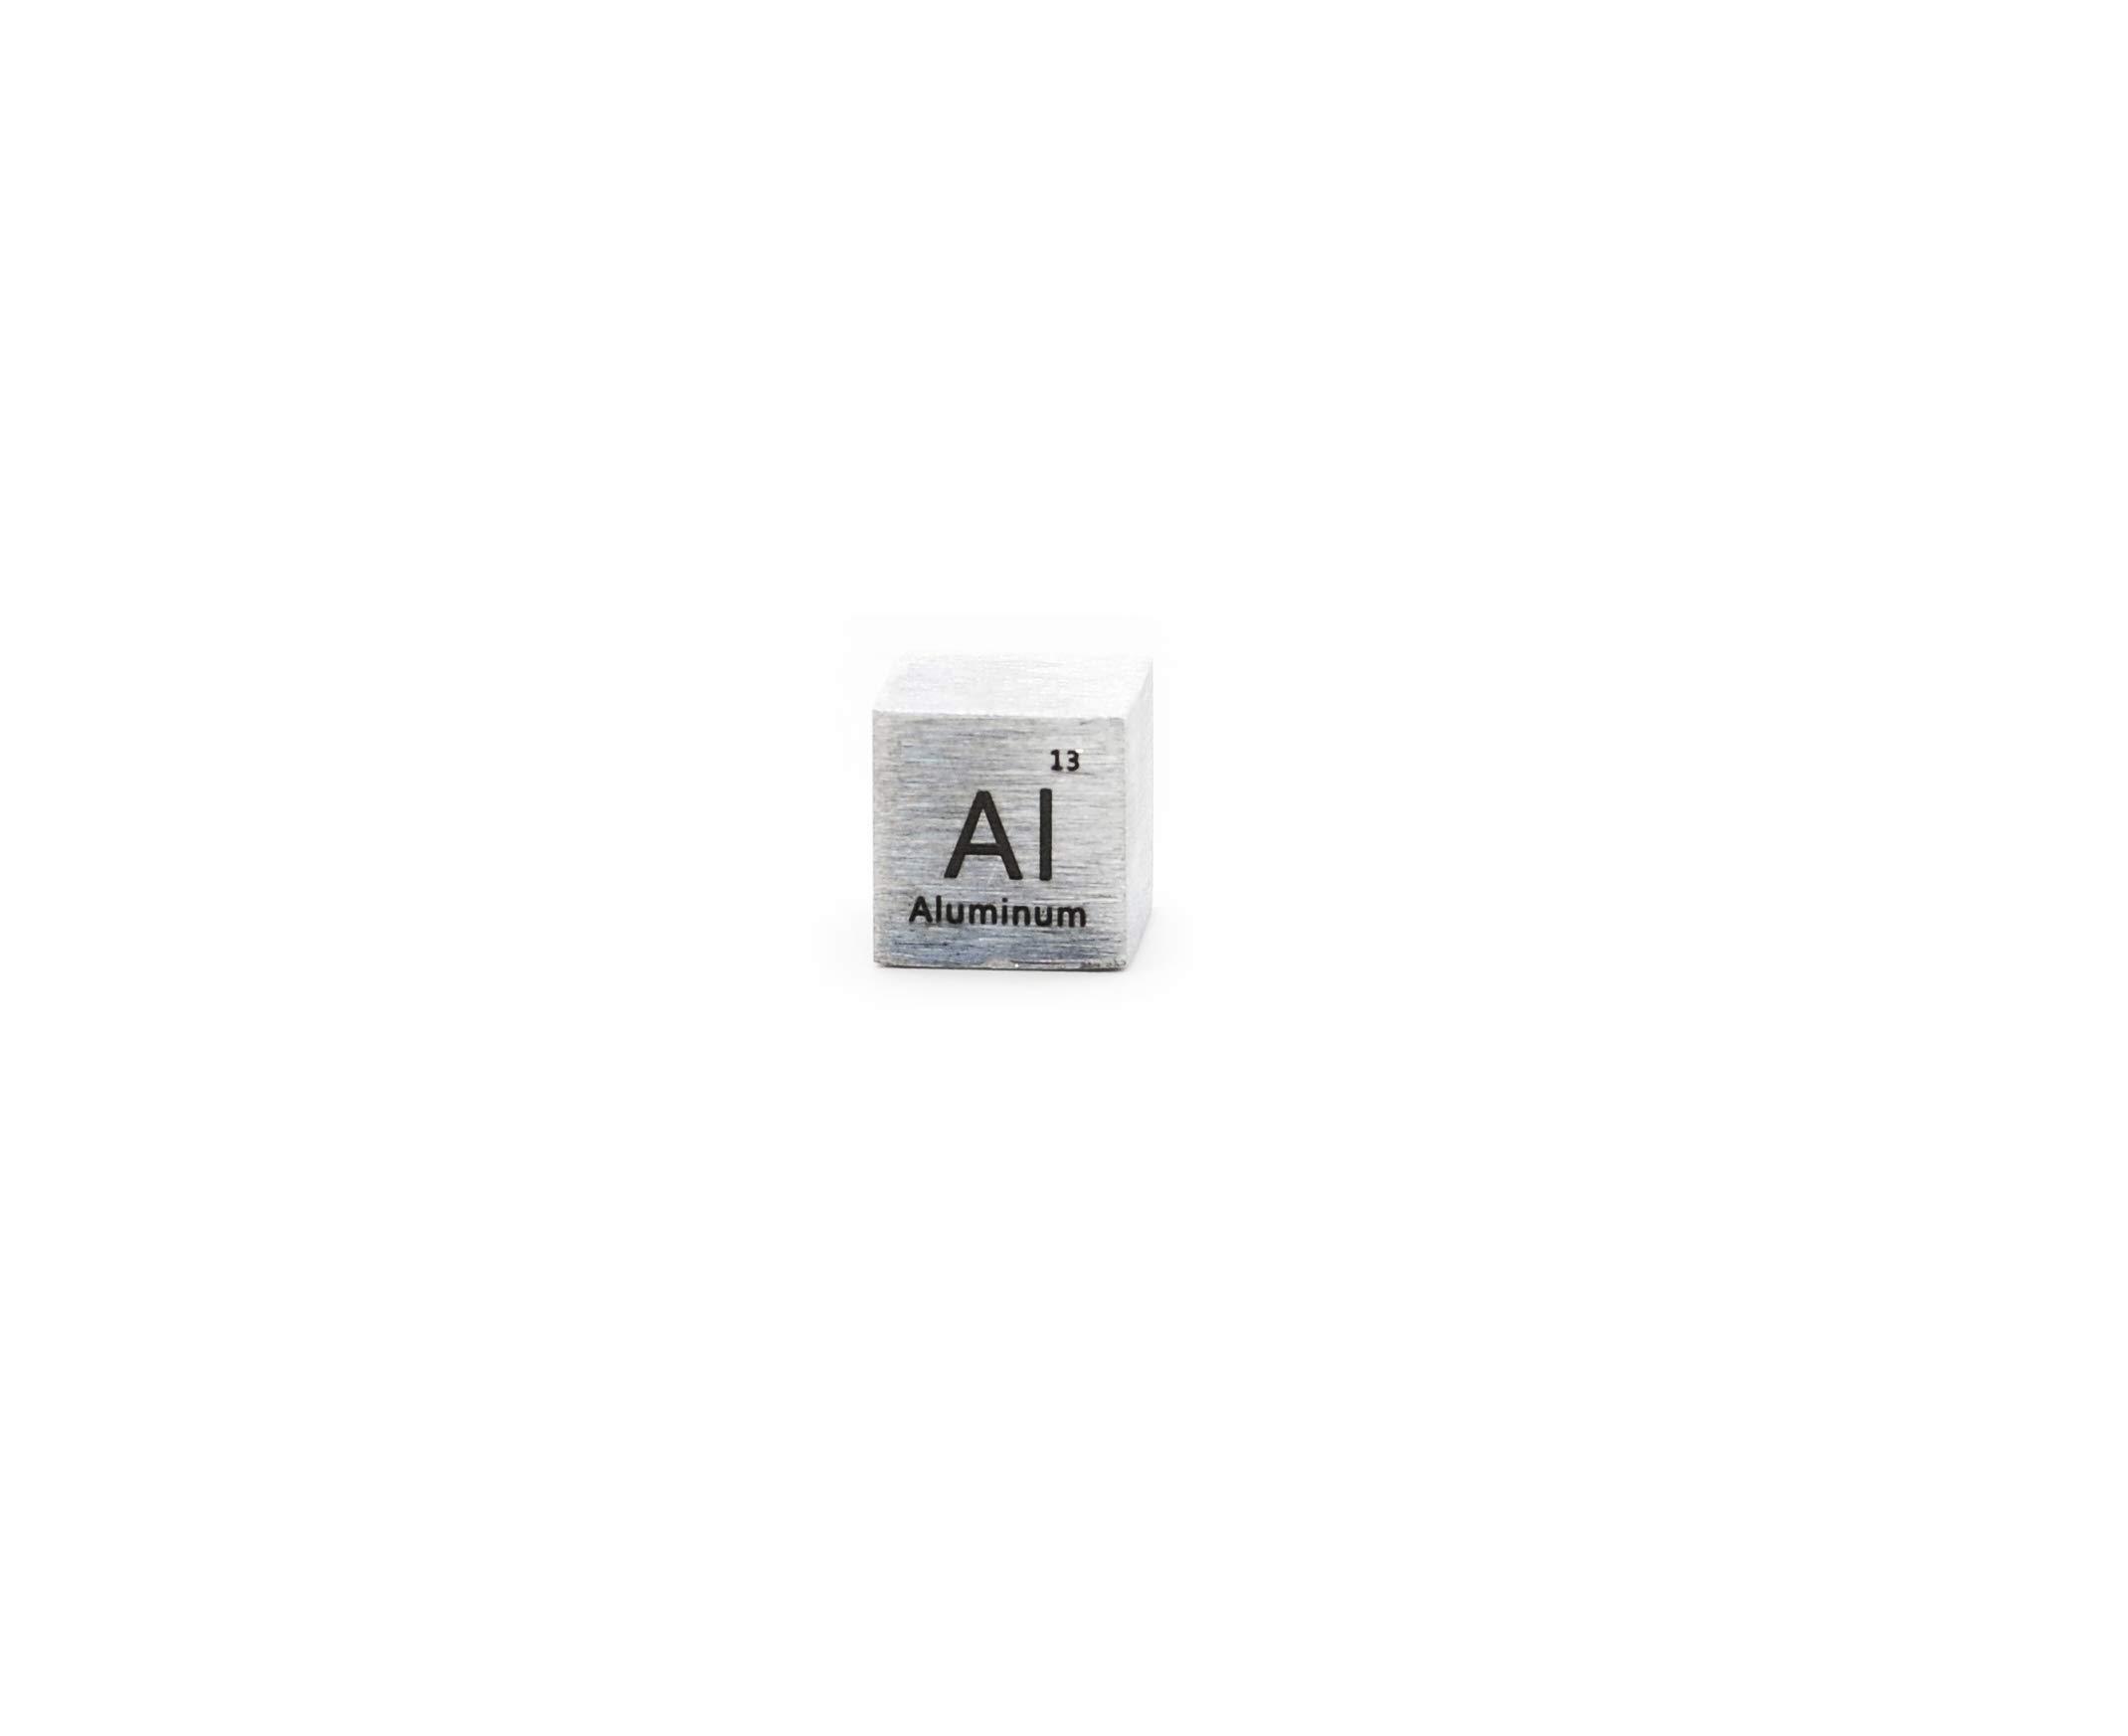 1 Inch Aluminum Metal Density Cube 99.99% Pure